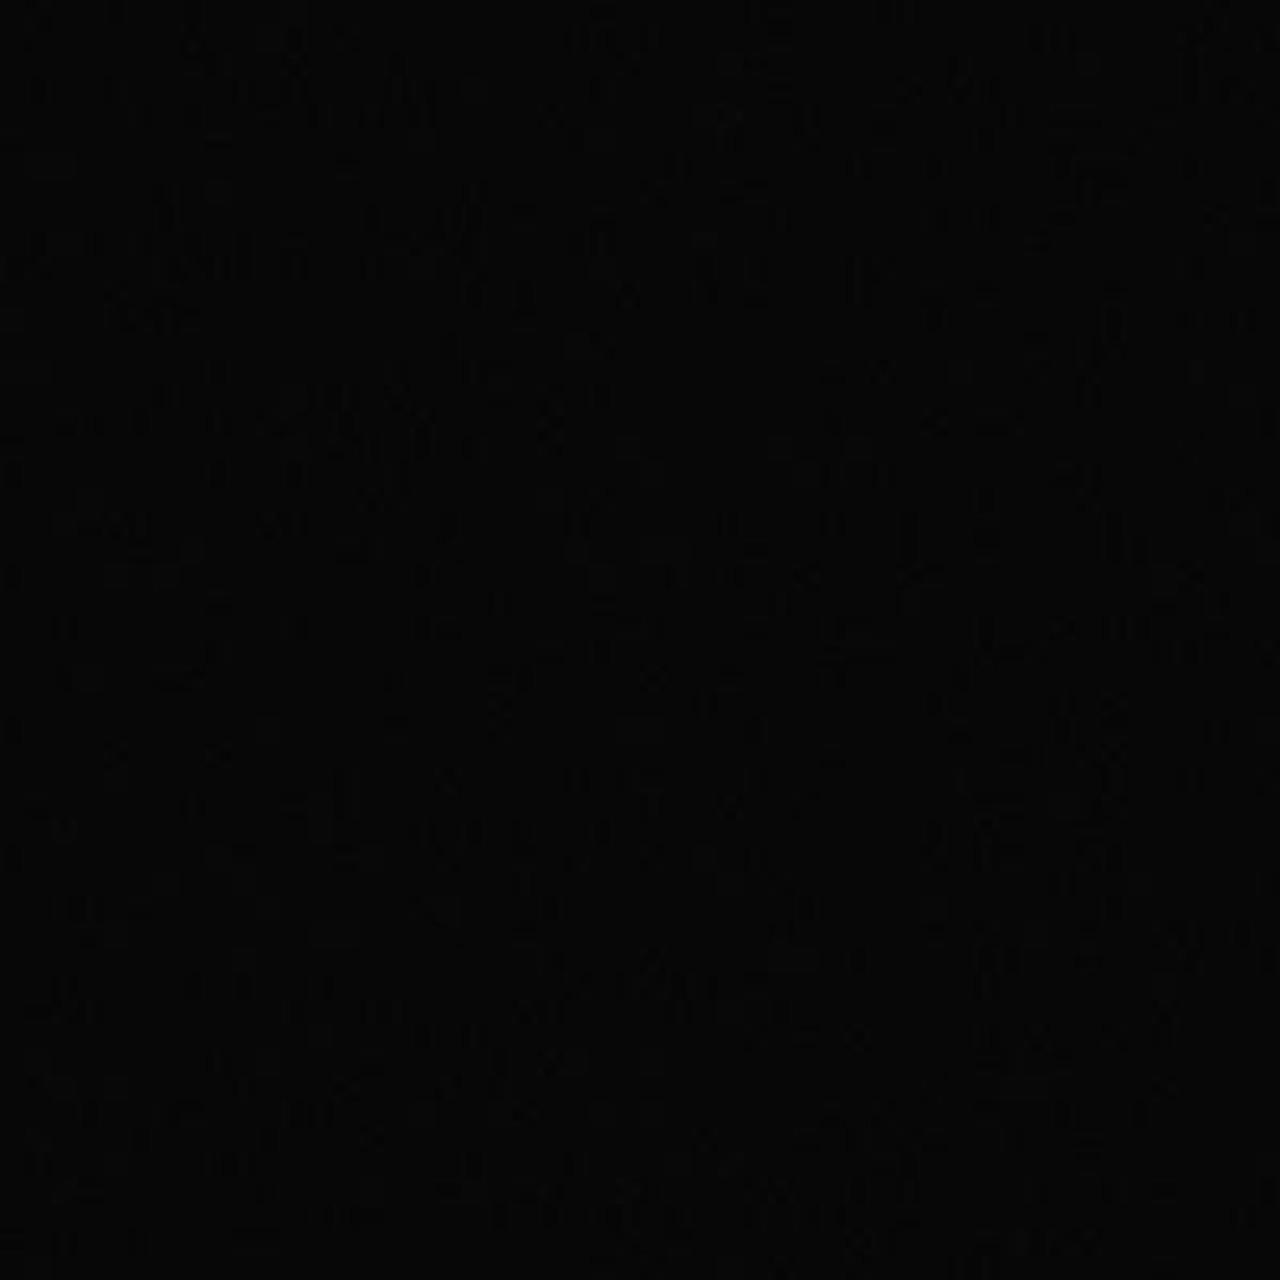 Formica 909 Black Matte, 4'x8'